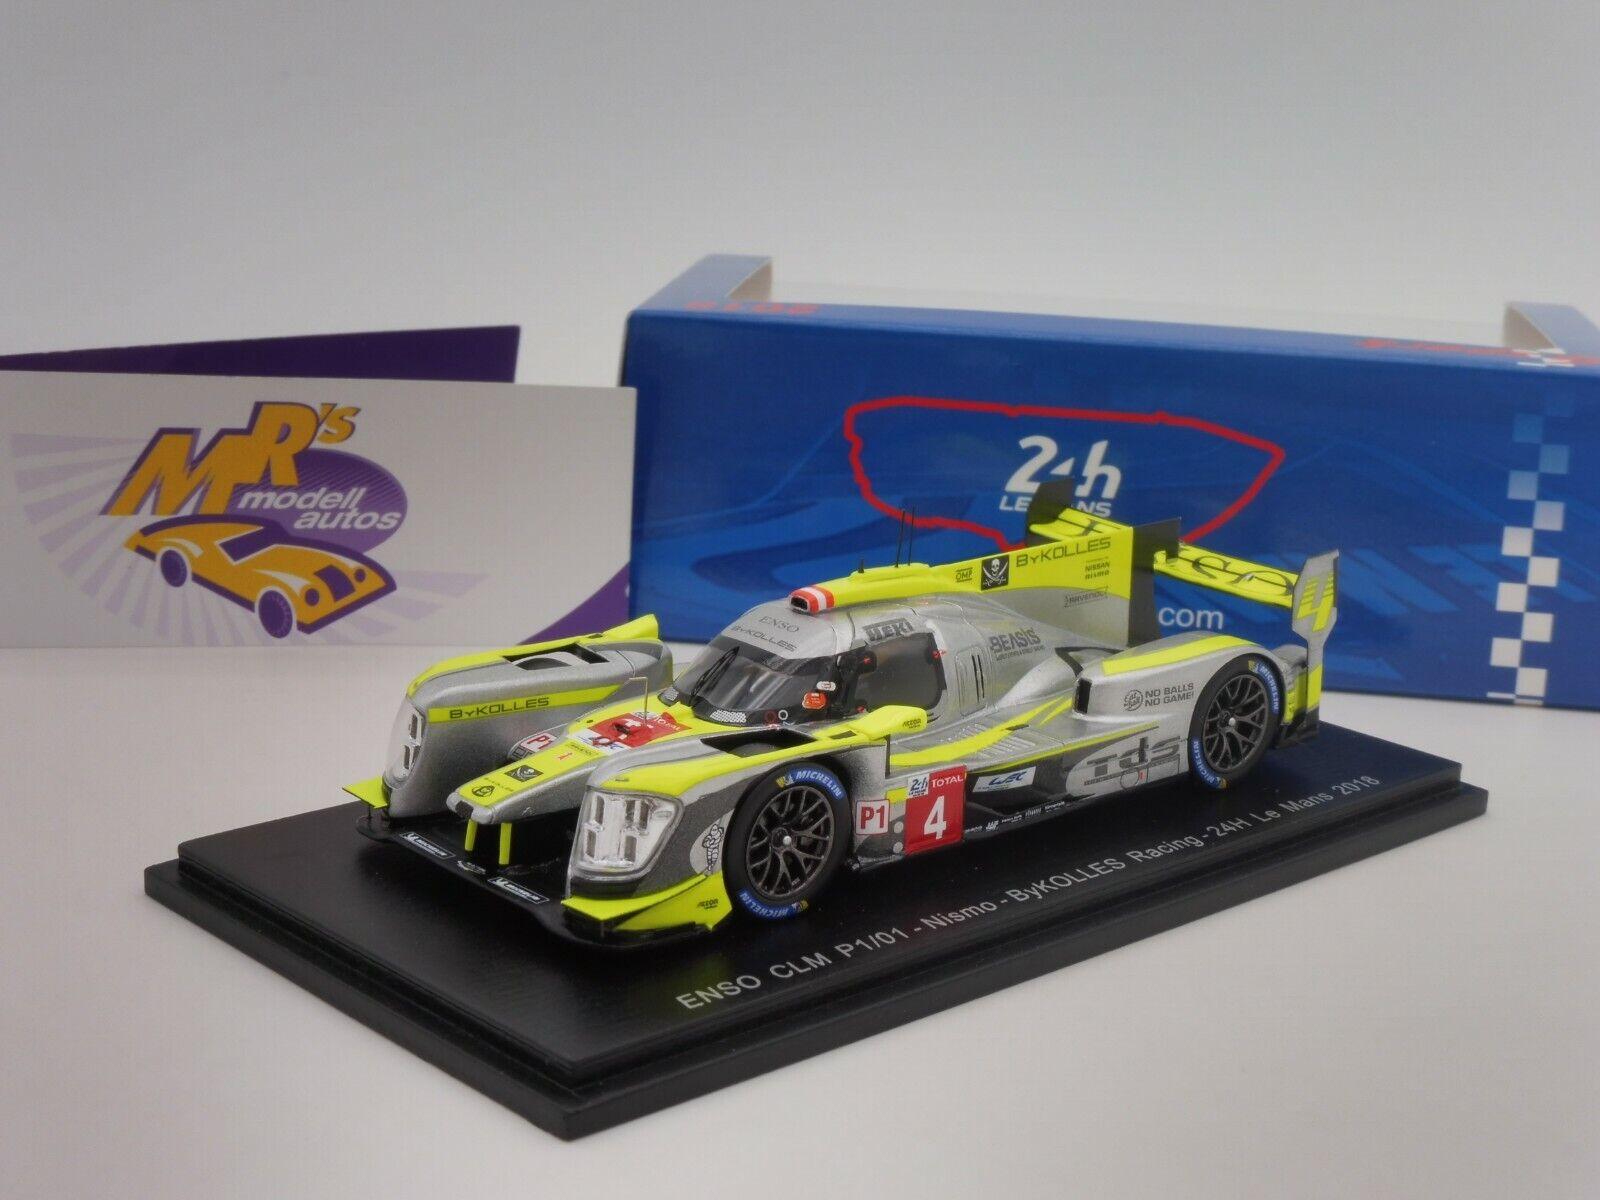 SPARK s7003    Enso CLM p1 01 Nismo 24 H. LE hommeS 2018  BYKOLLES Racing  1 43  très populaire